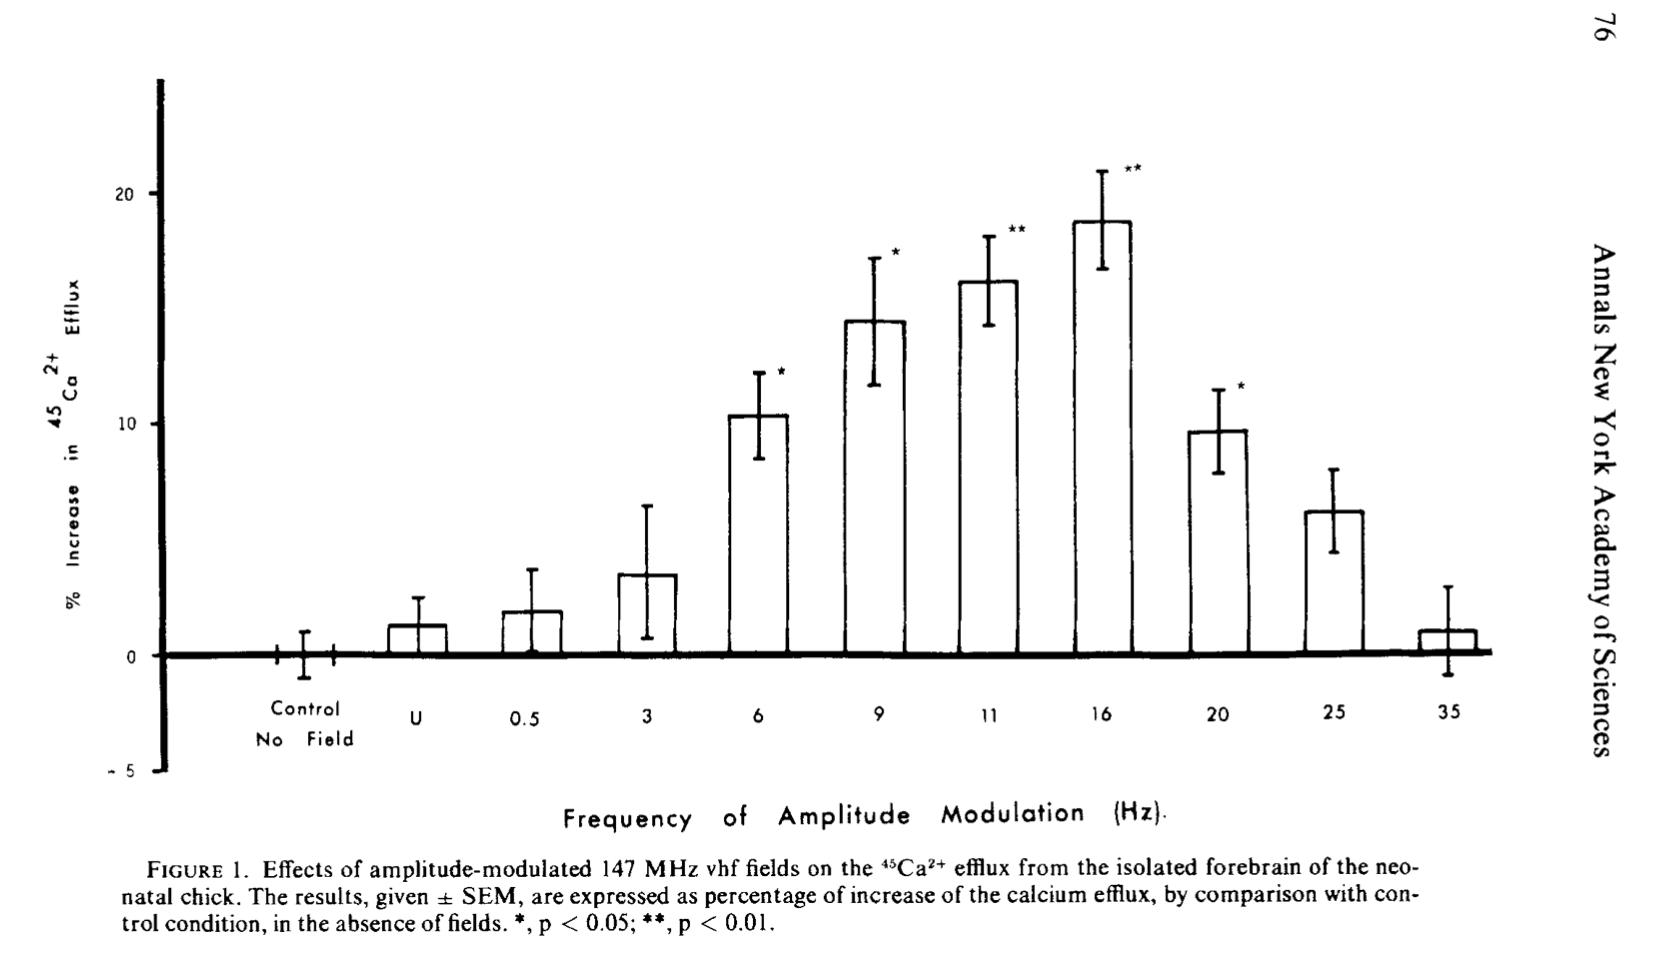 Ross Adey calcium efflux at 16 Hz, NYAS